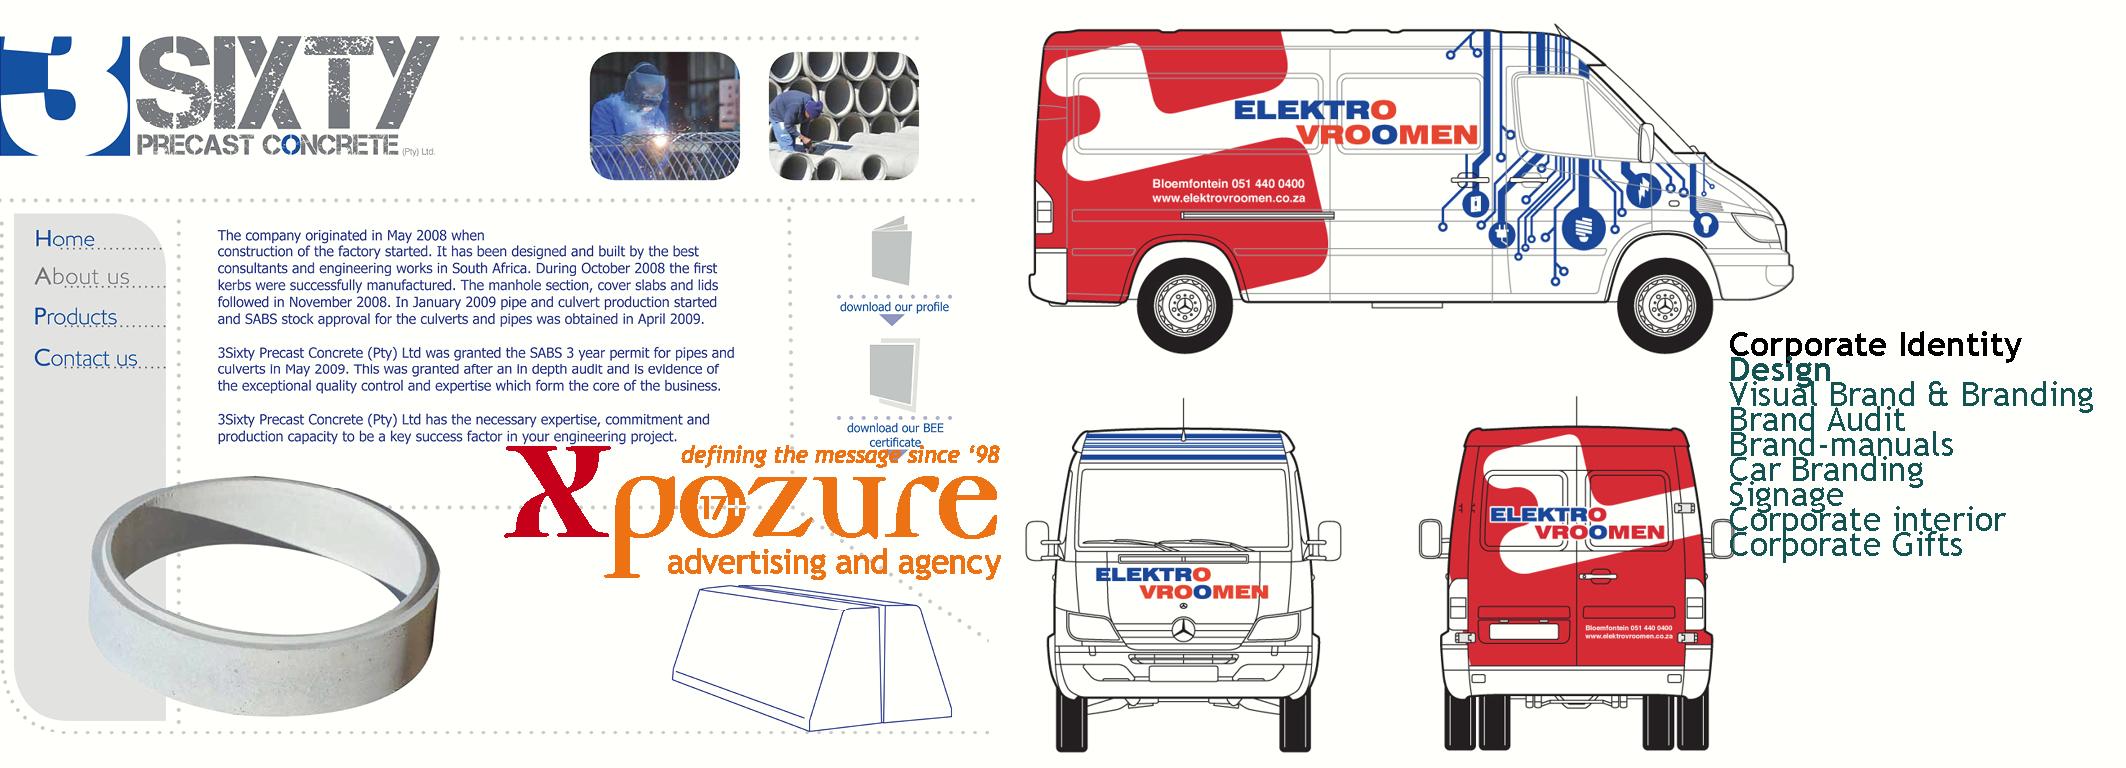 Brand Manuals